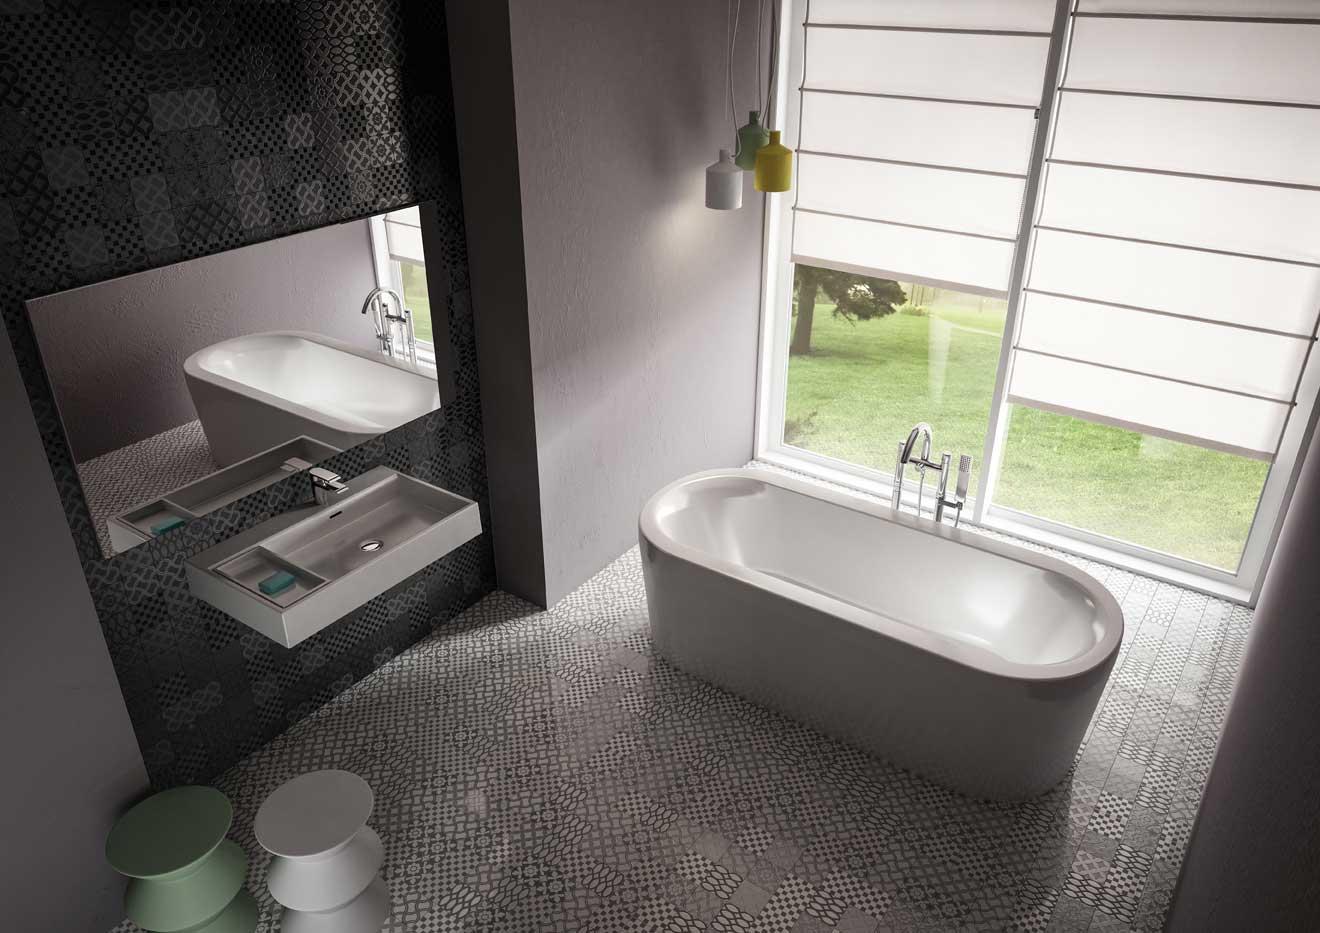 La baignoire lot la star de la salle de bains for Teuco baignoire